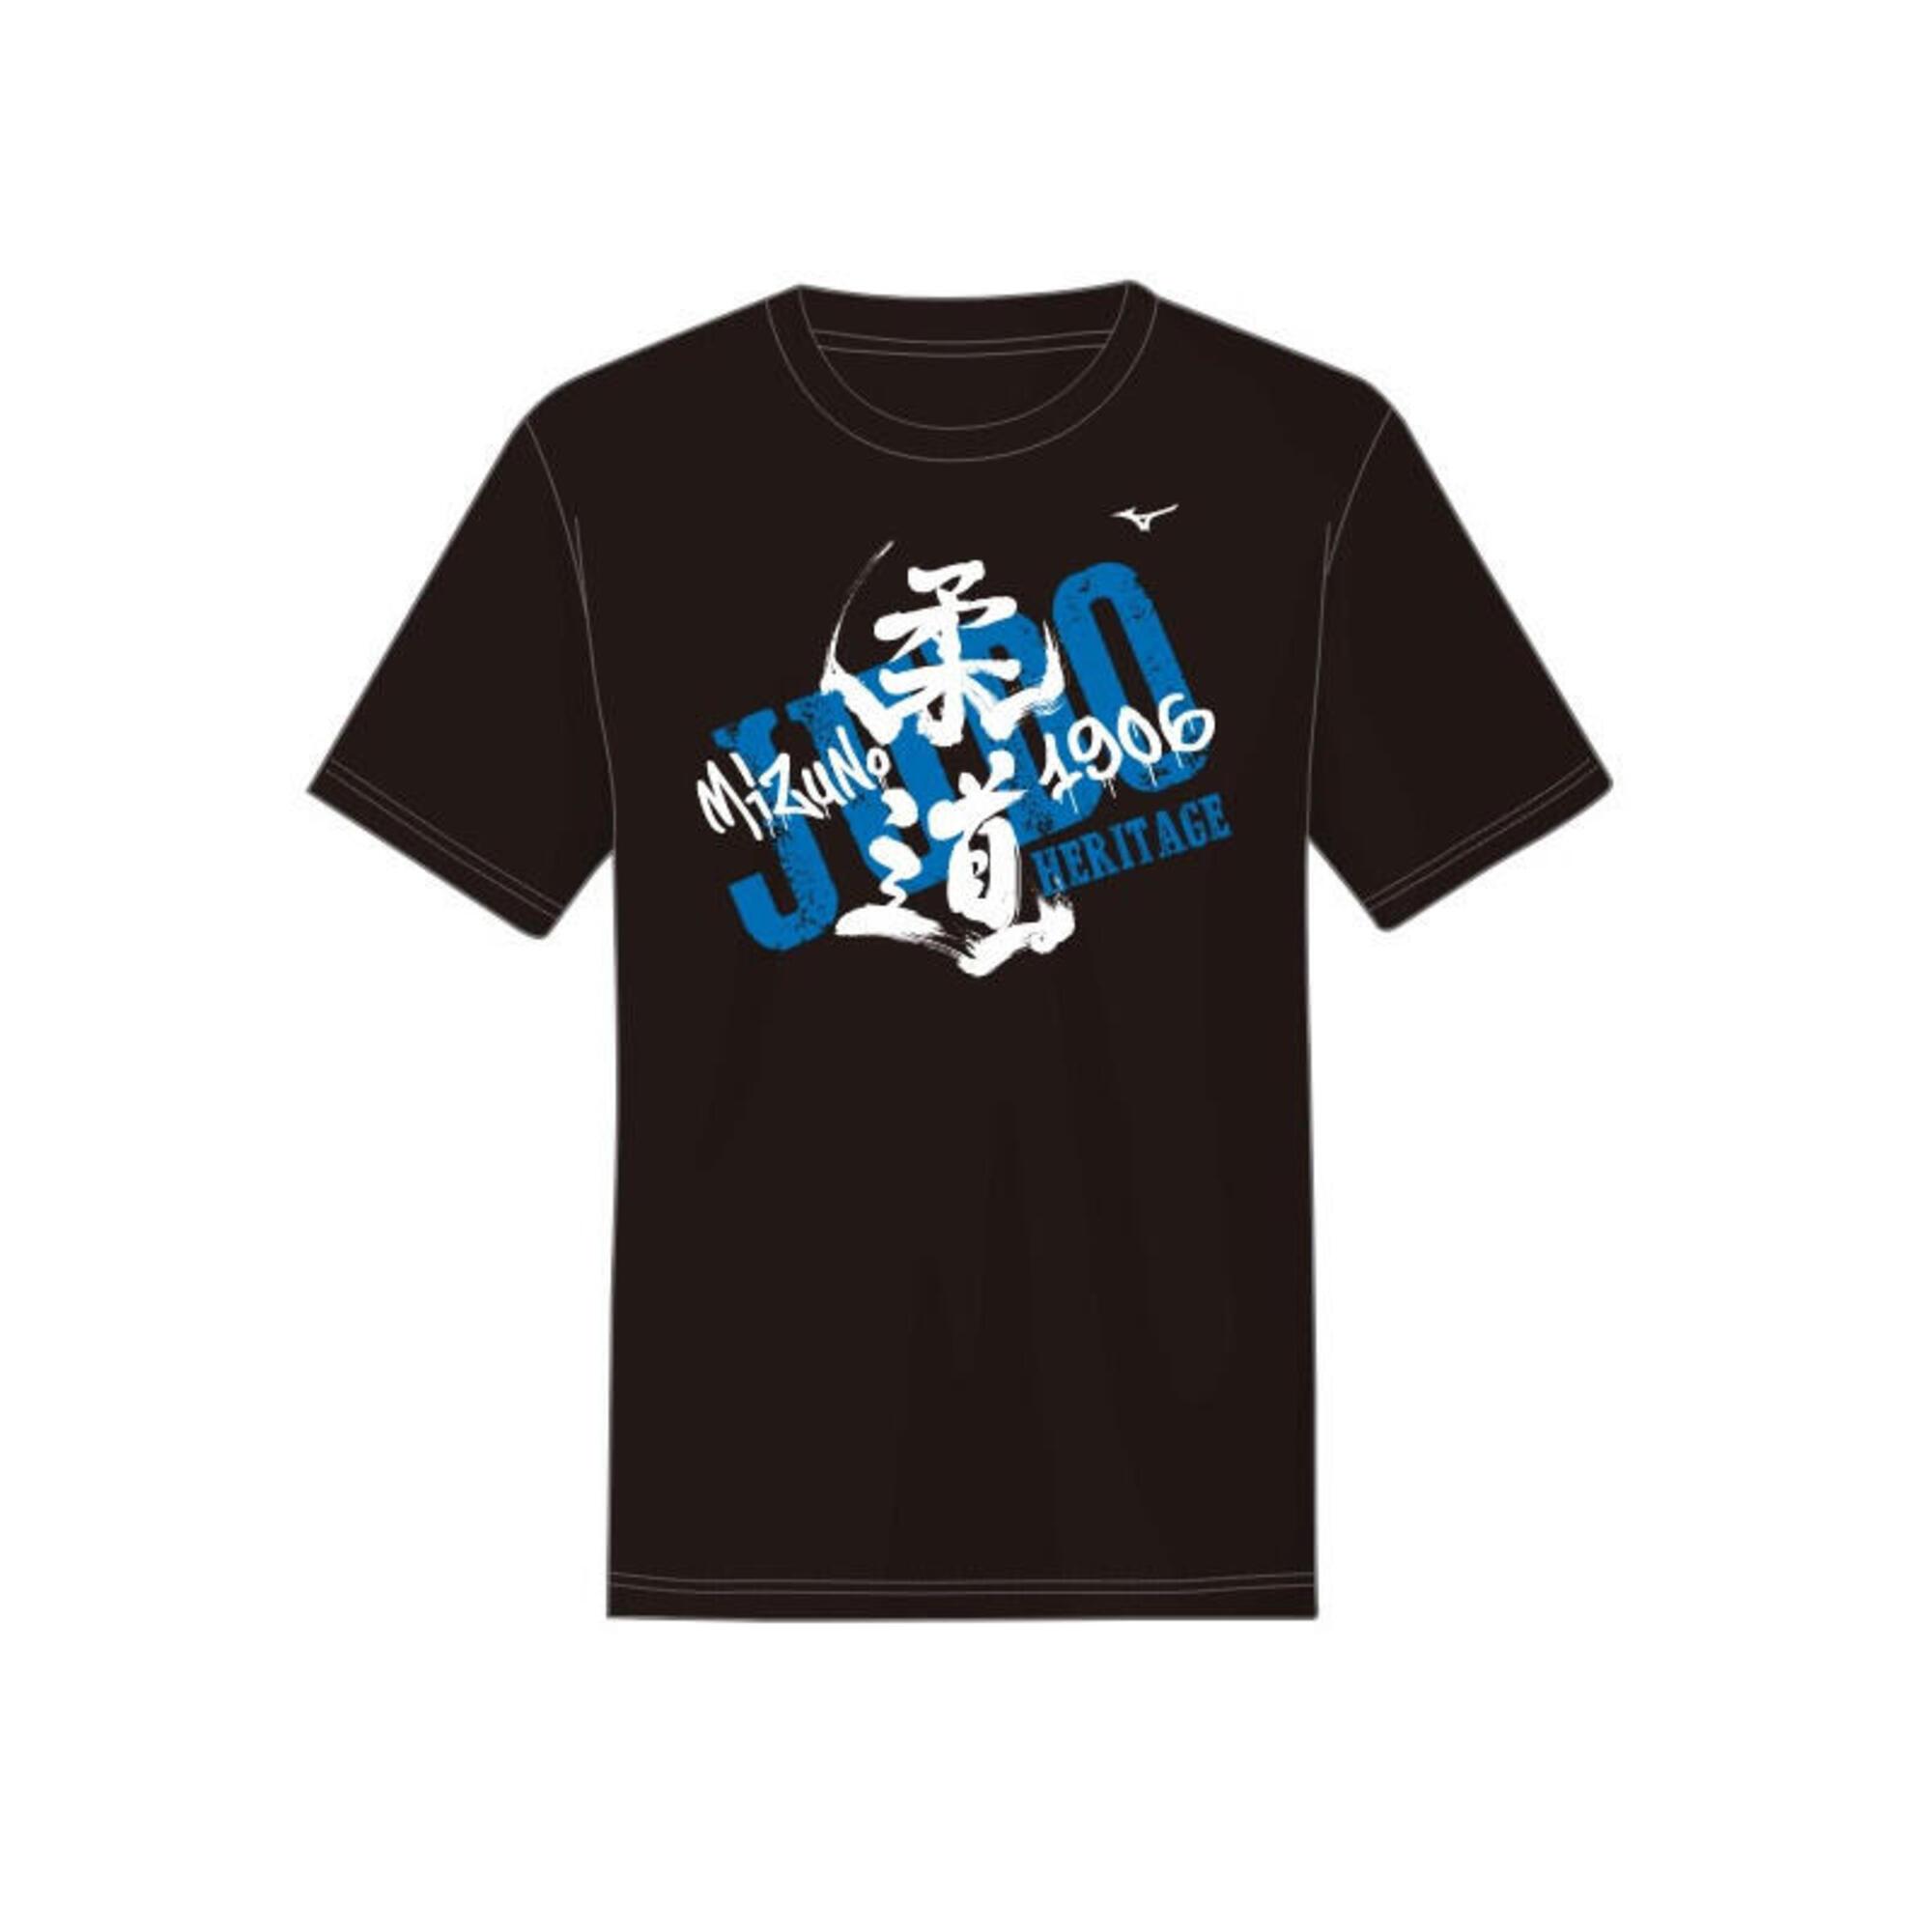 Tee-shirt judo heritage mizuno